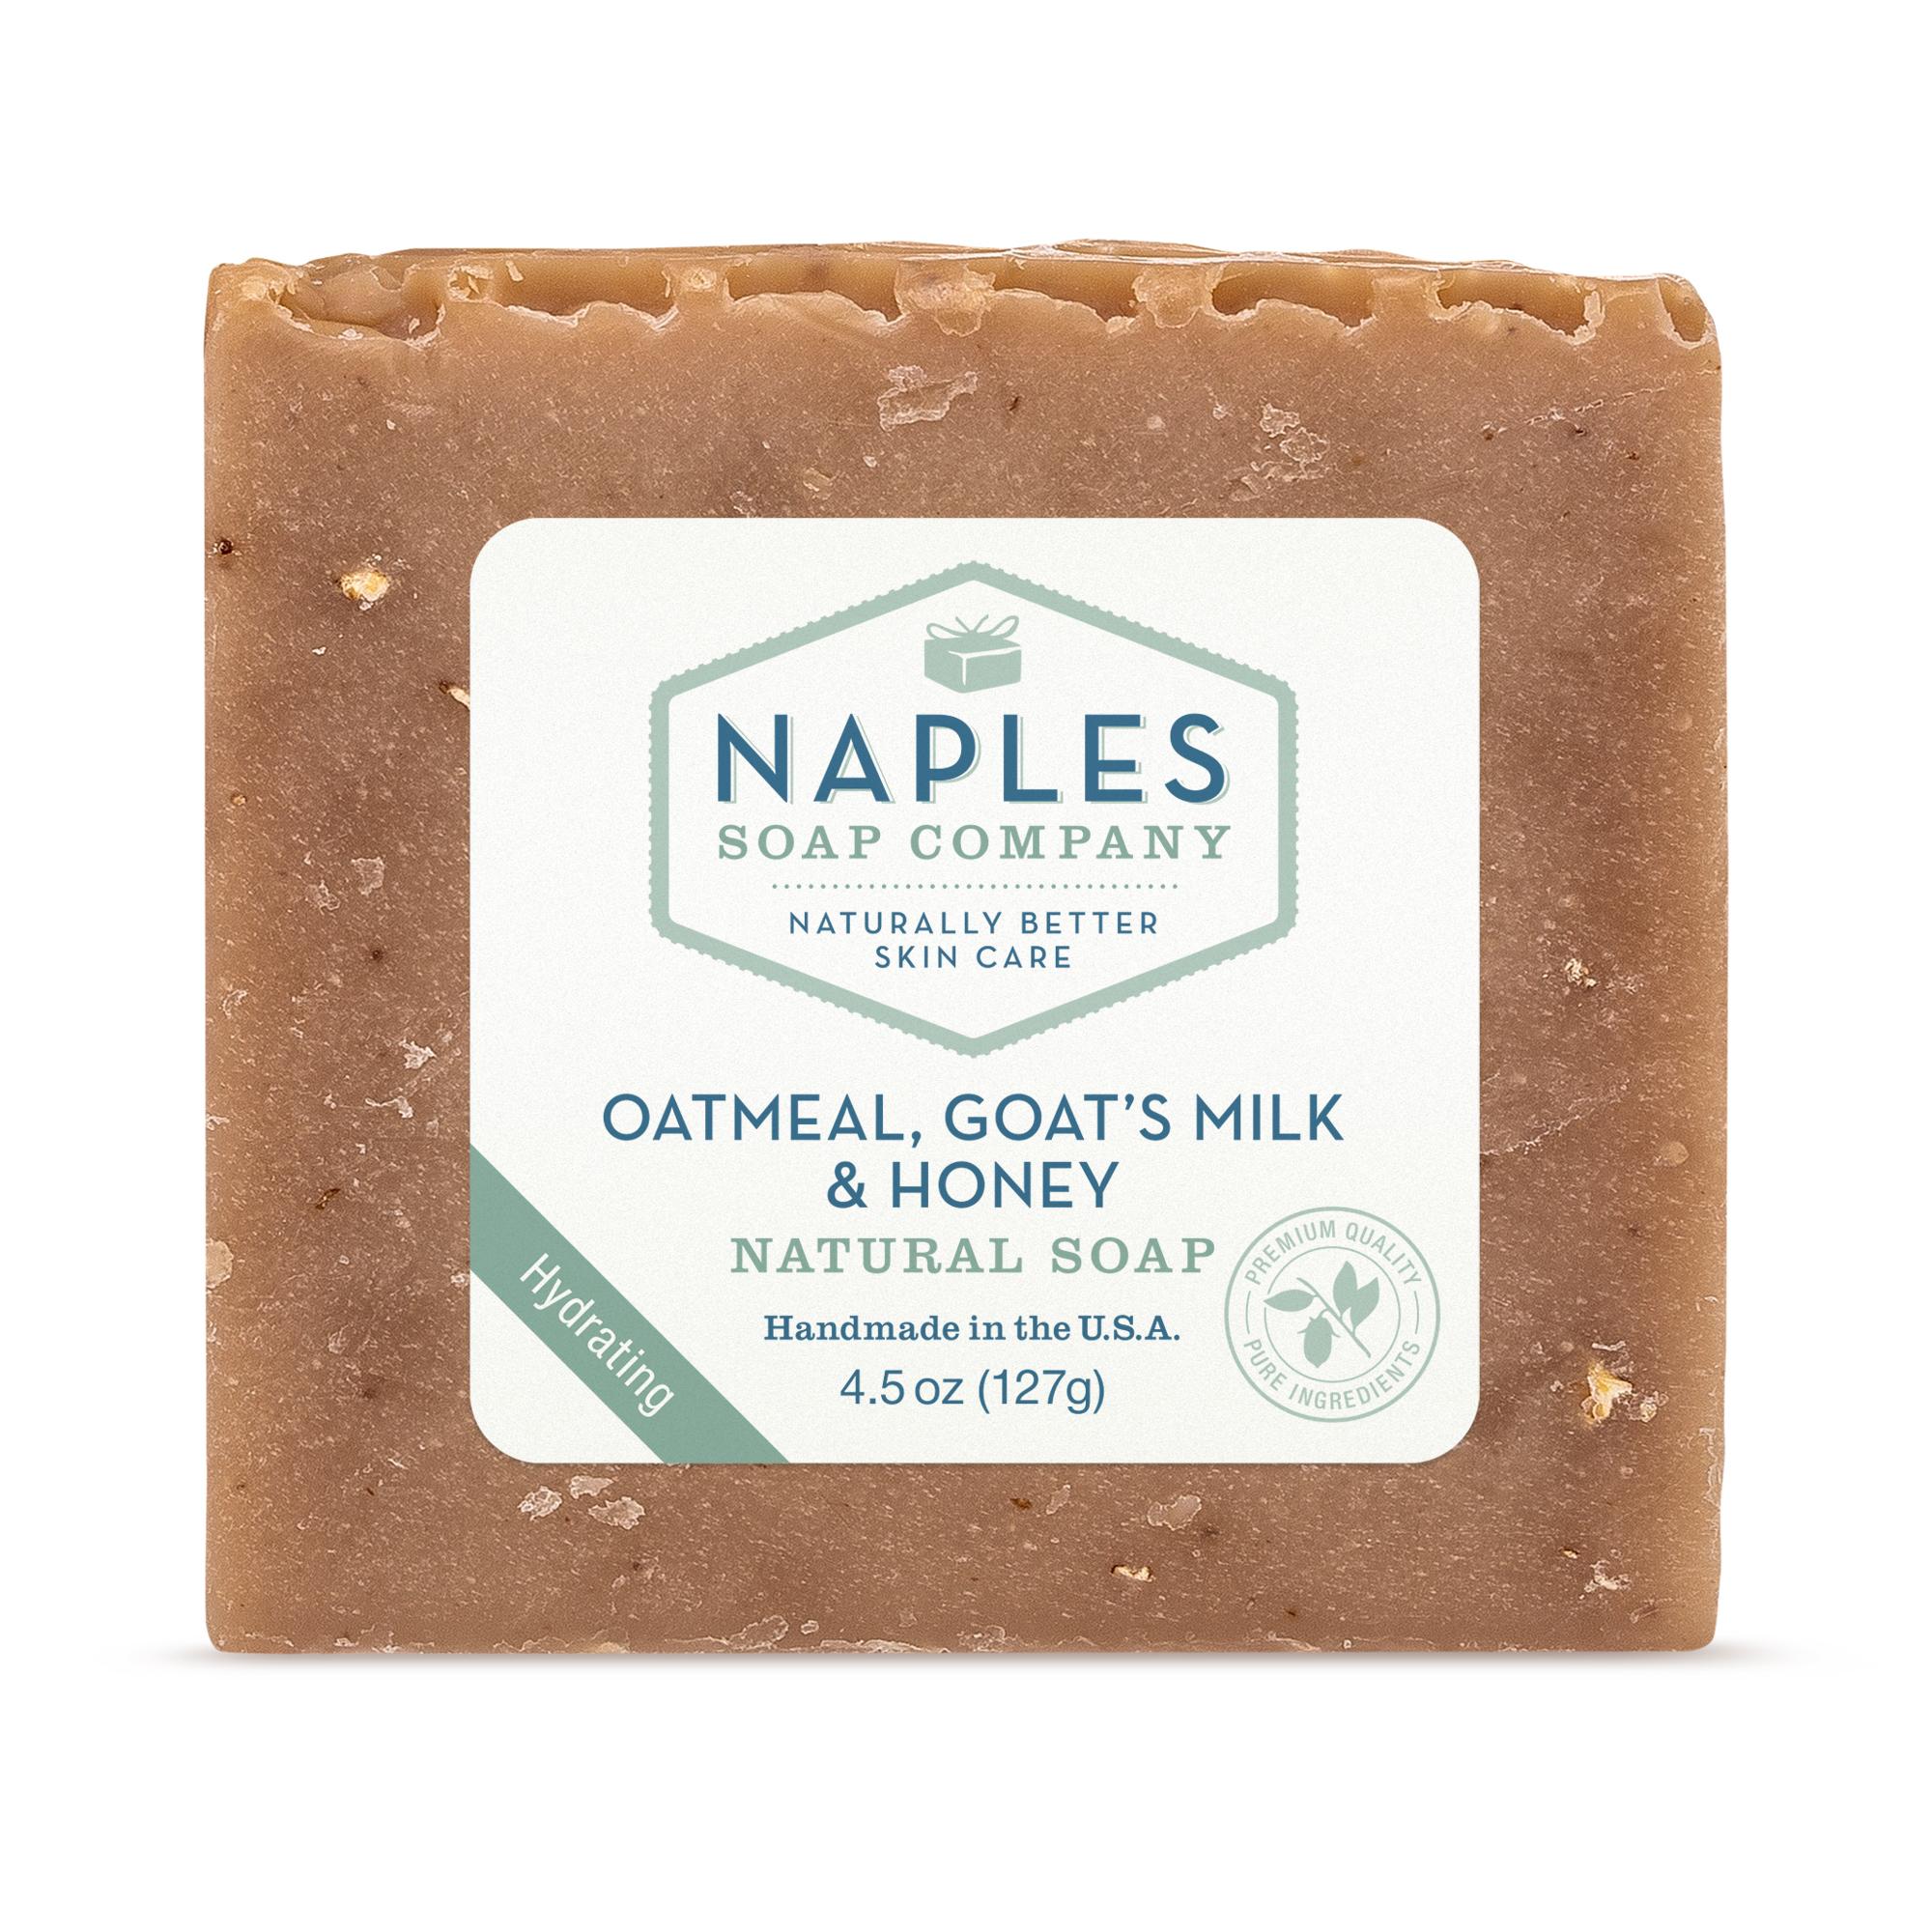 Oatmeal Goats Milk and Honey Natural Soap